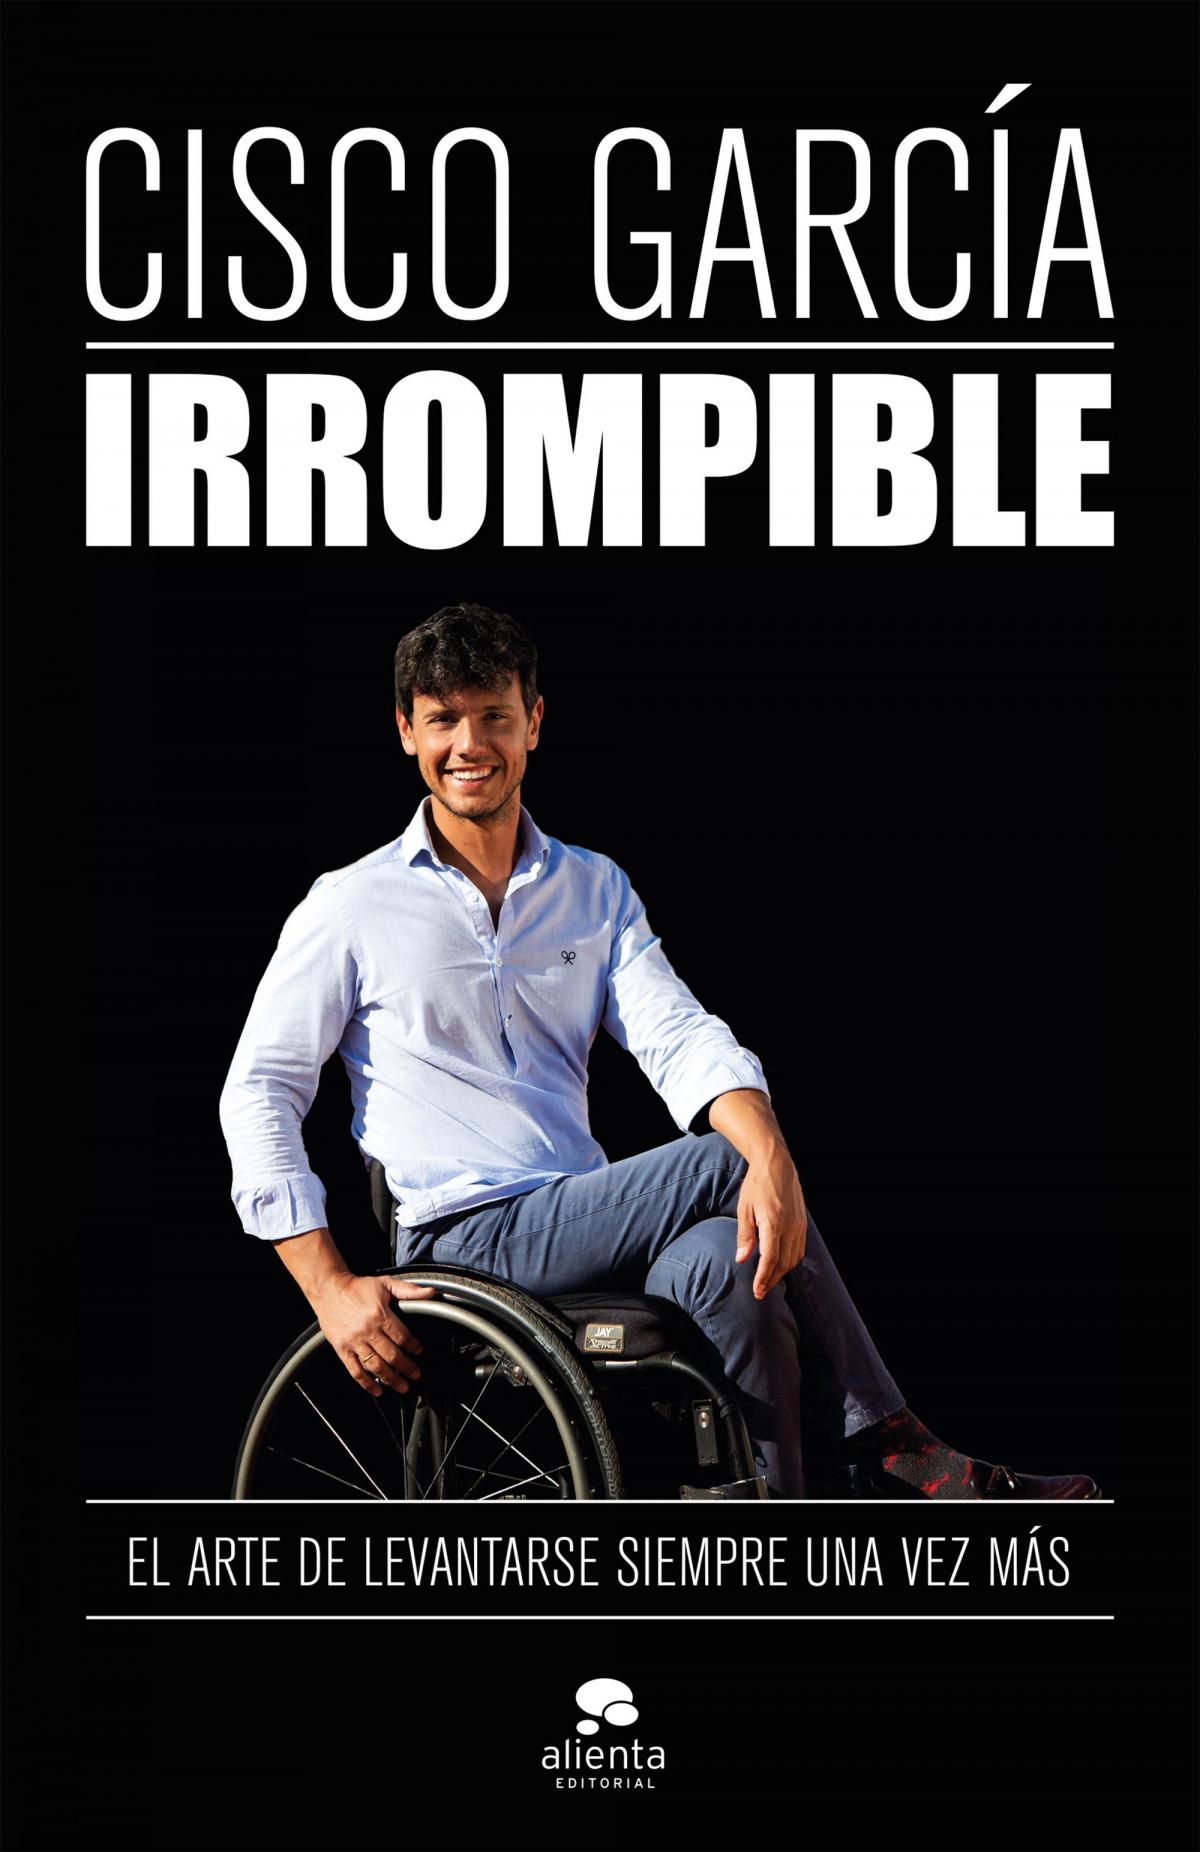 Irrompible